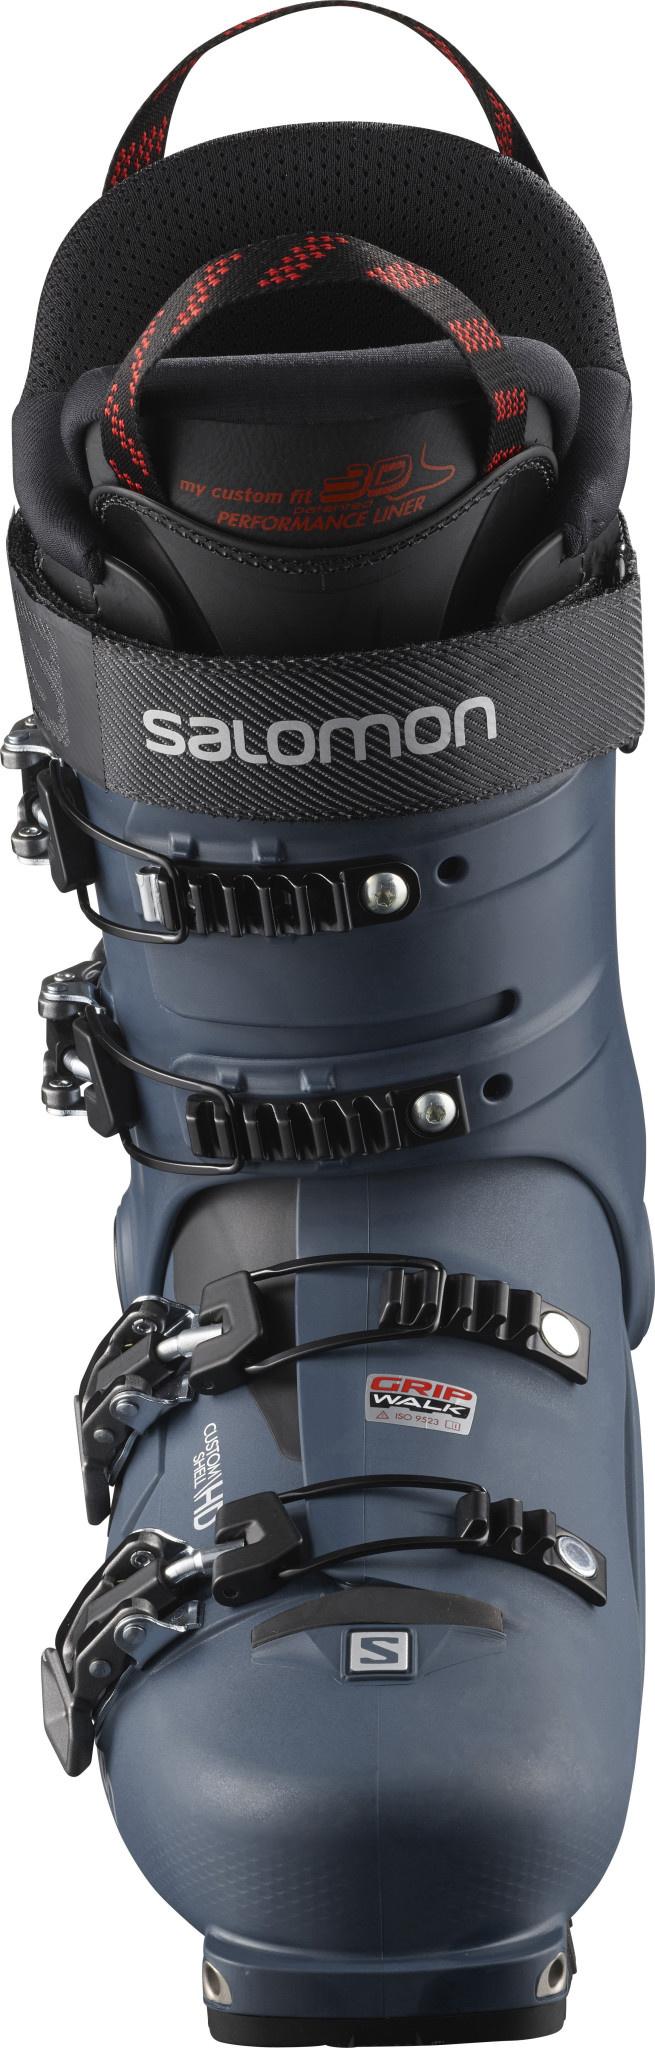 Salomon Shift Pro 100 At-3